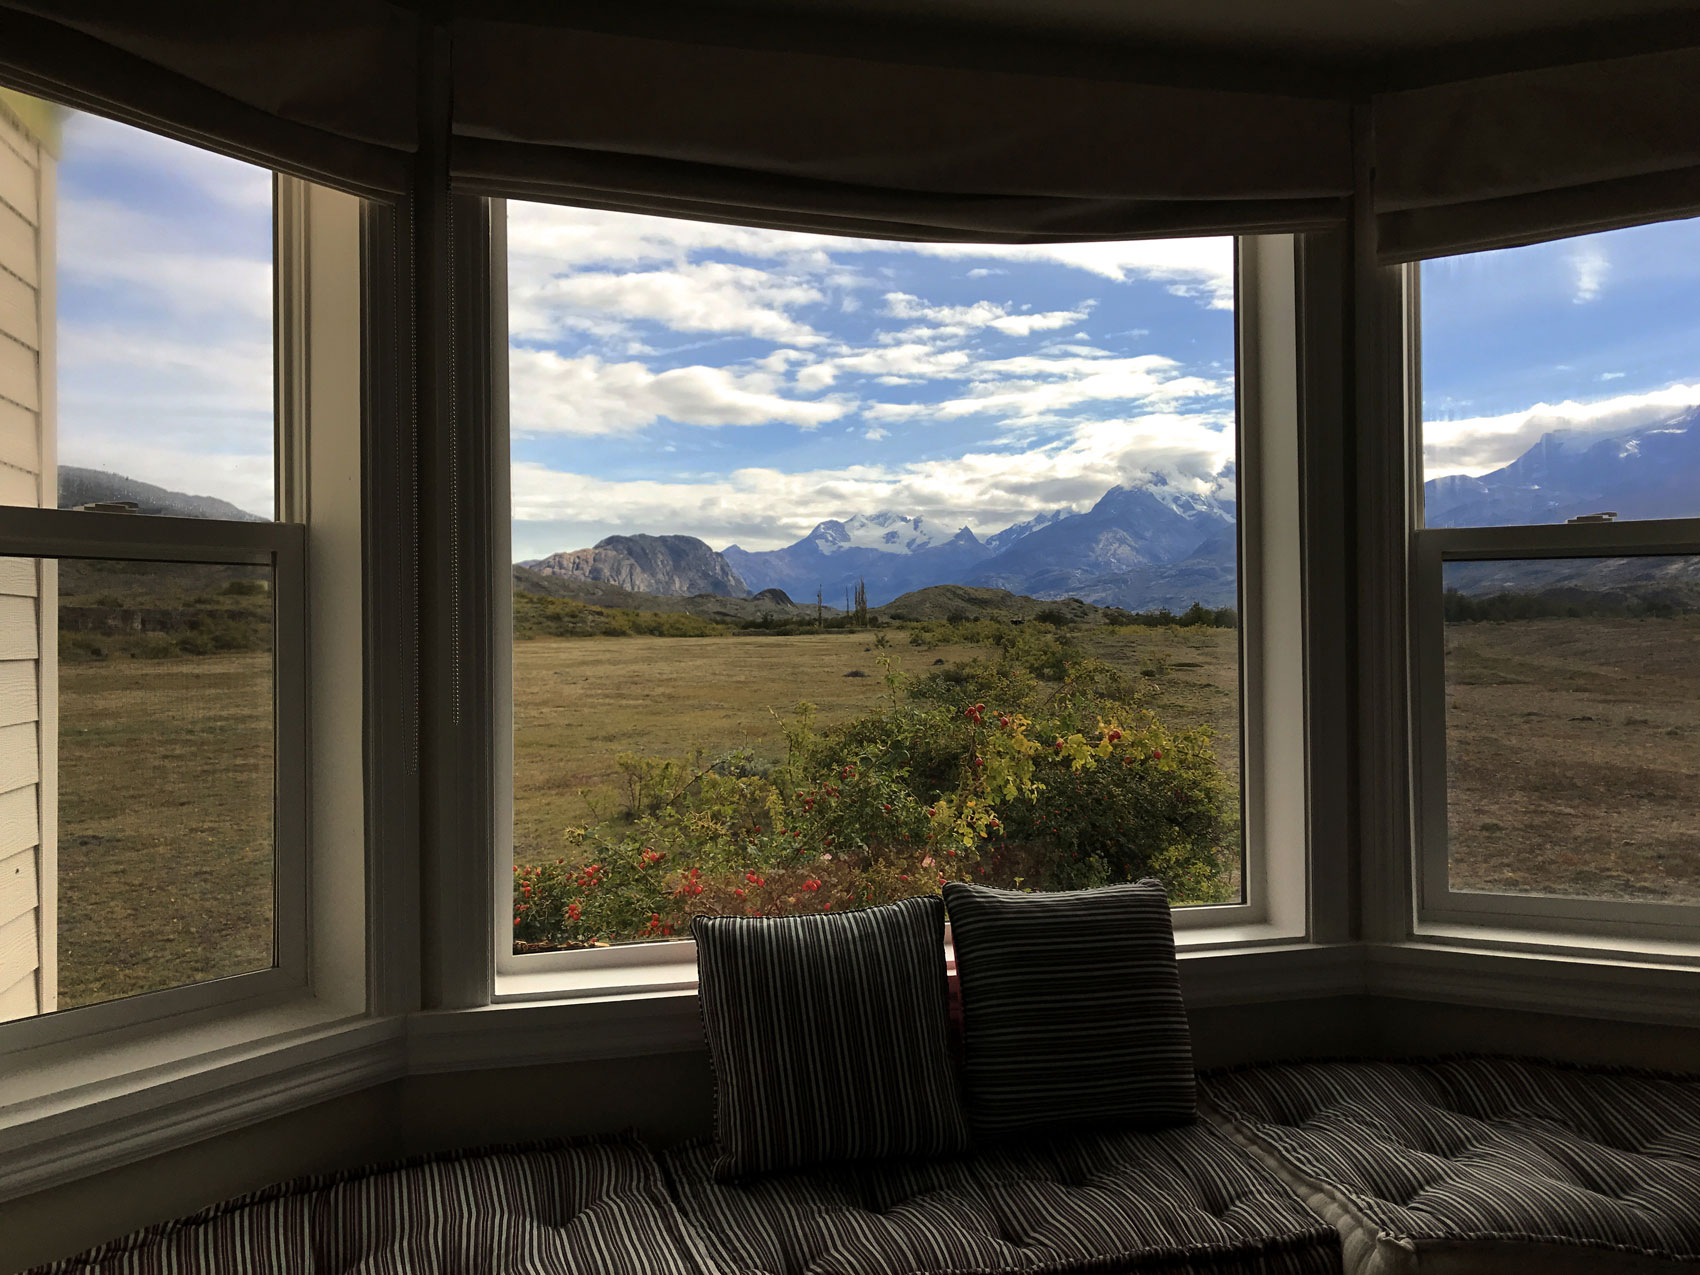 Estancia Cristina Room View Glaciers National Park